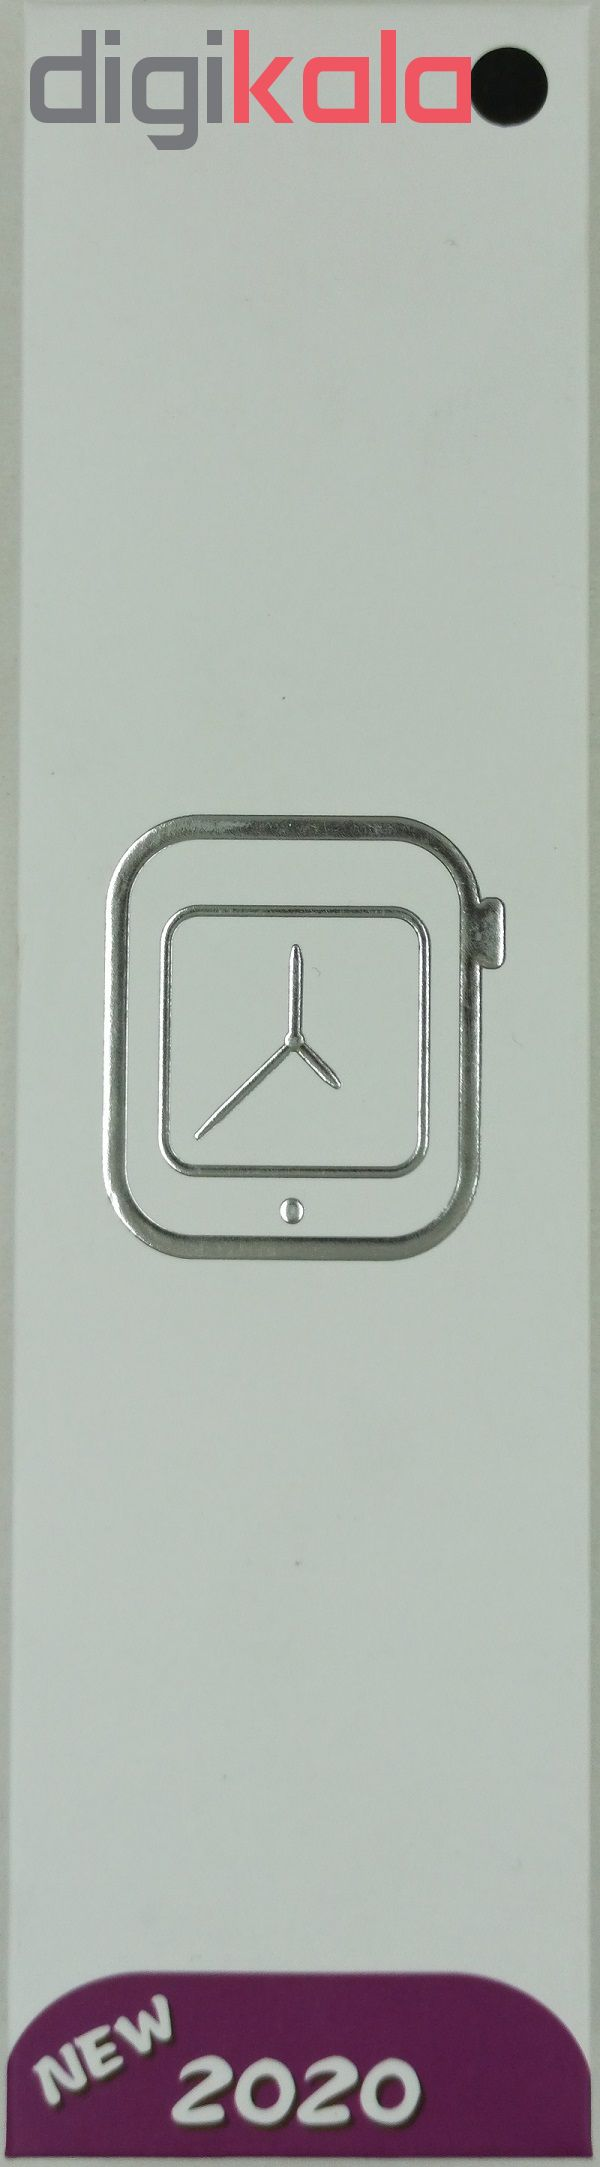 ساعت هوشمند مدل C200